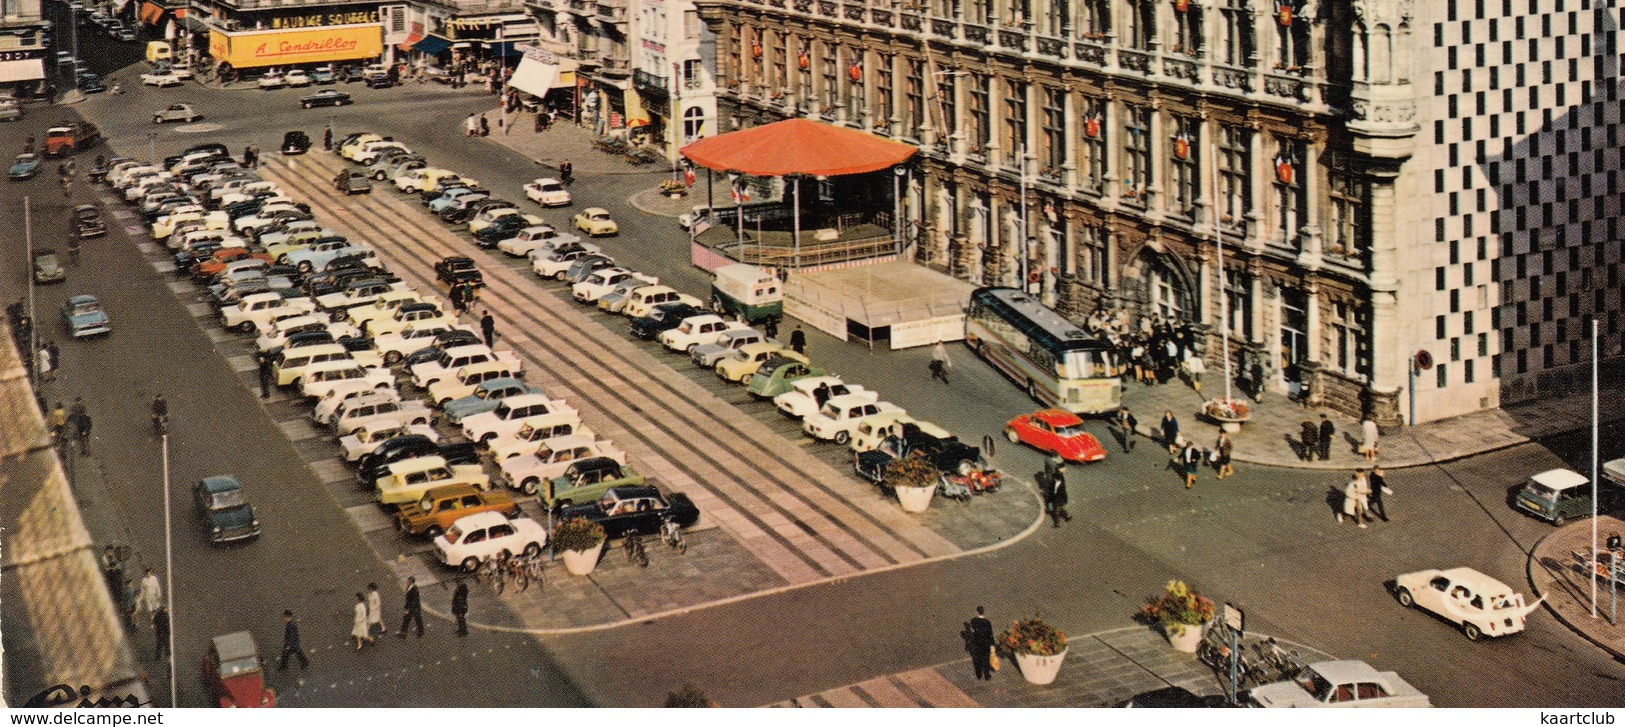 Valenciennes: DAF DAFFODIL, SIMCA 1000, CITROËN AMI 6, 2CV, DKW 3=6, FIAT 850, RENAULT 4, PEUGEOT 404 - L'Hotel De Ville - Toerisme